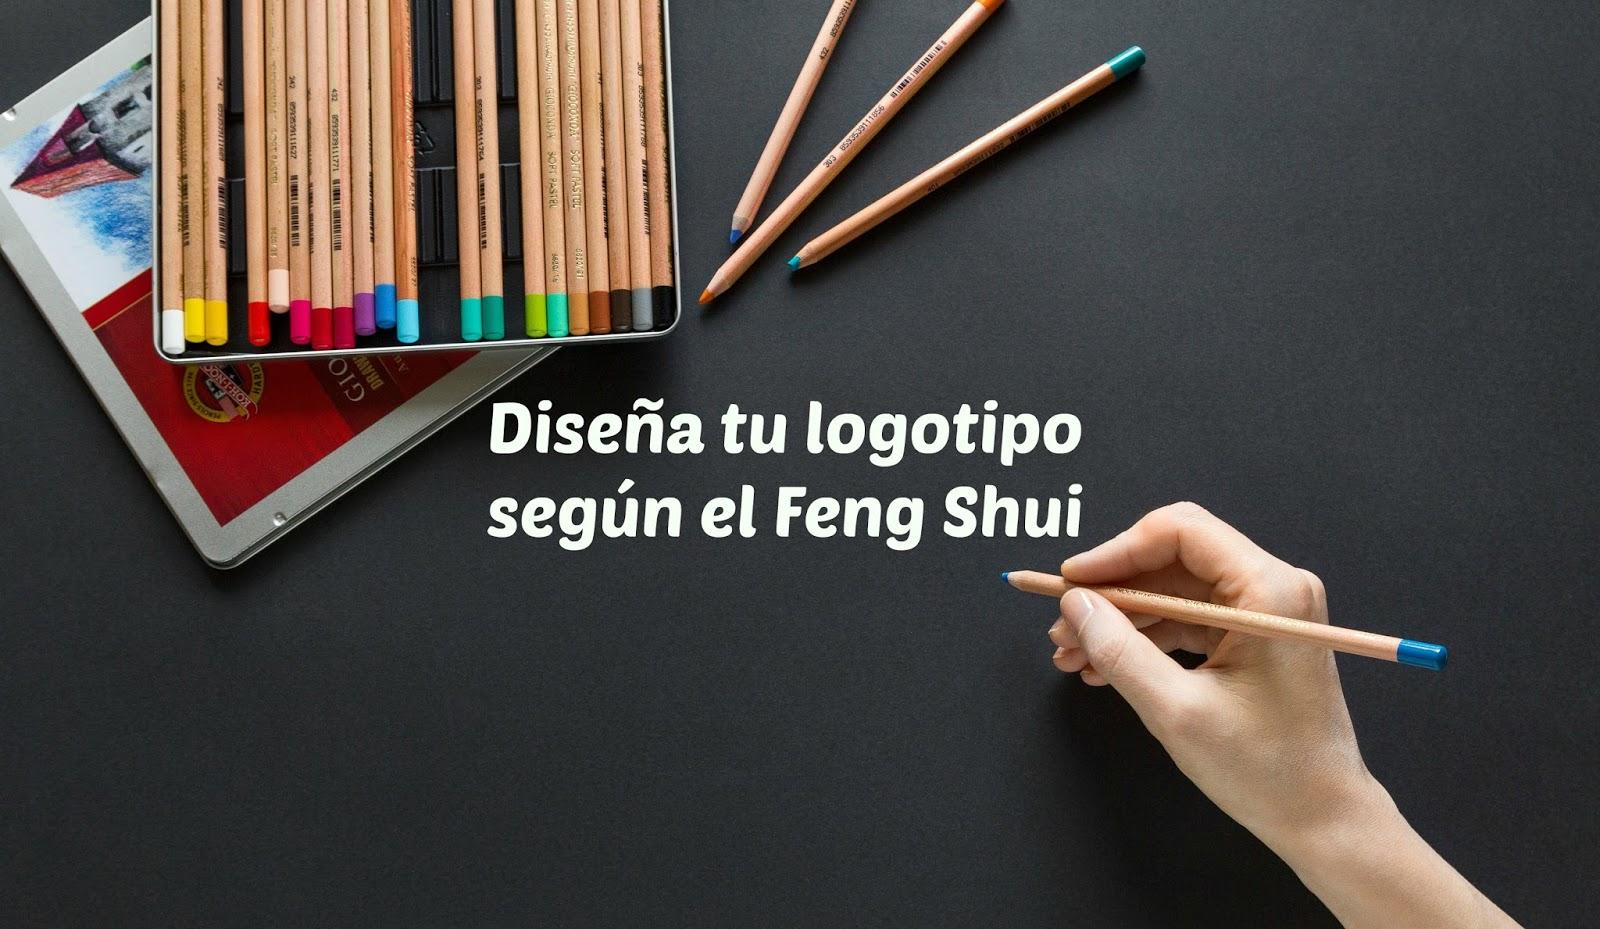 Feng shui fusi n cu l es el logotipo ideal para tu - El mejor libro de feng shui ...